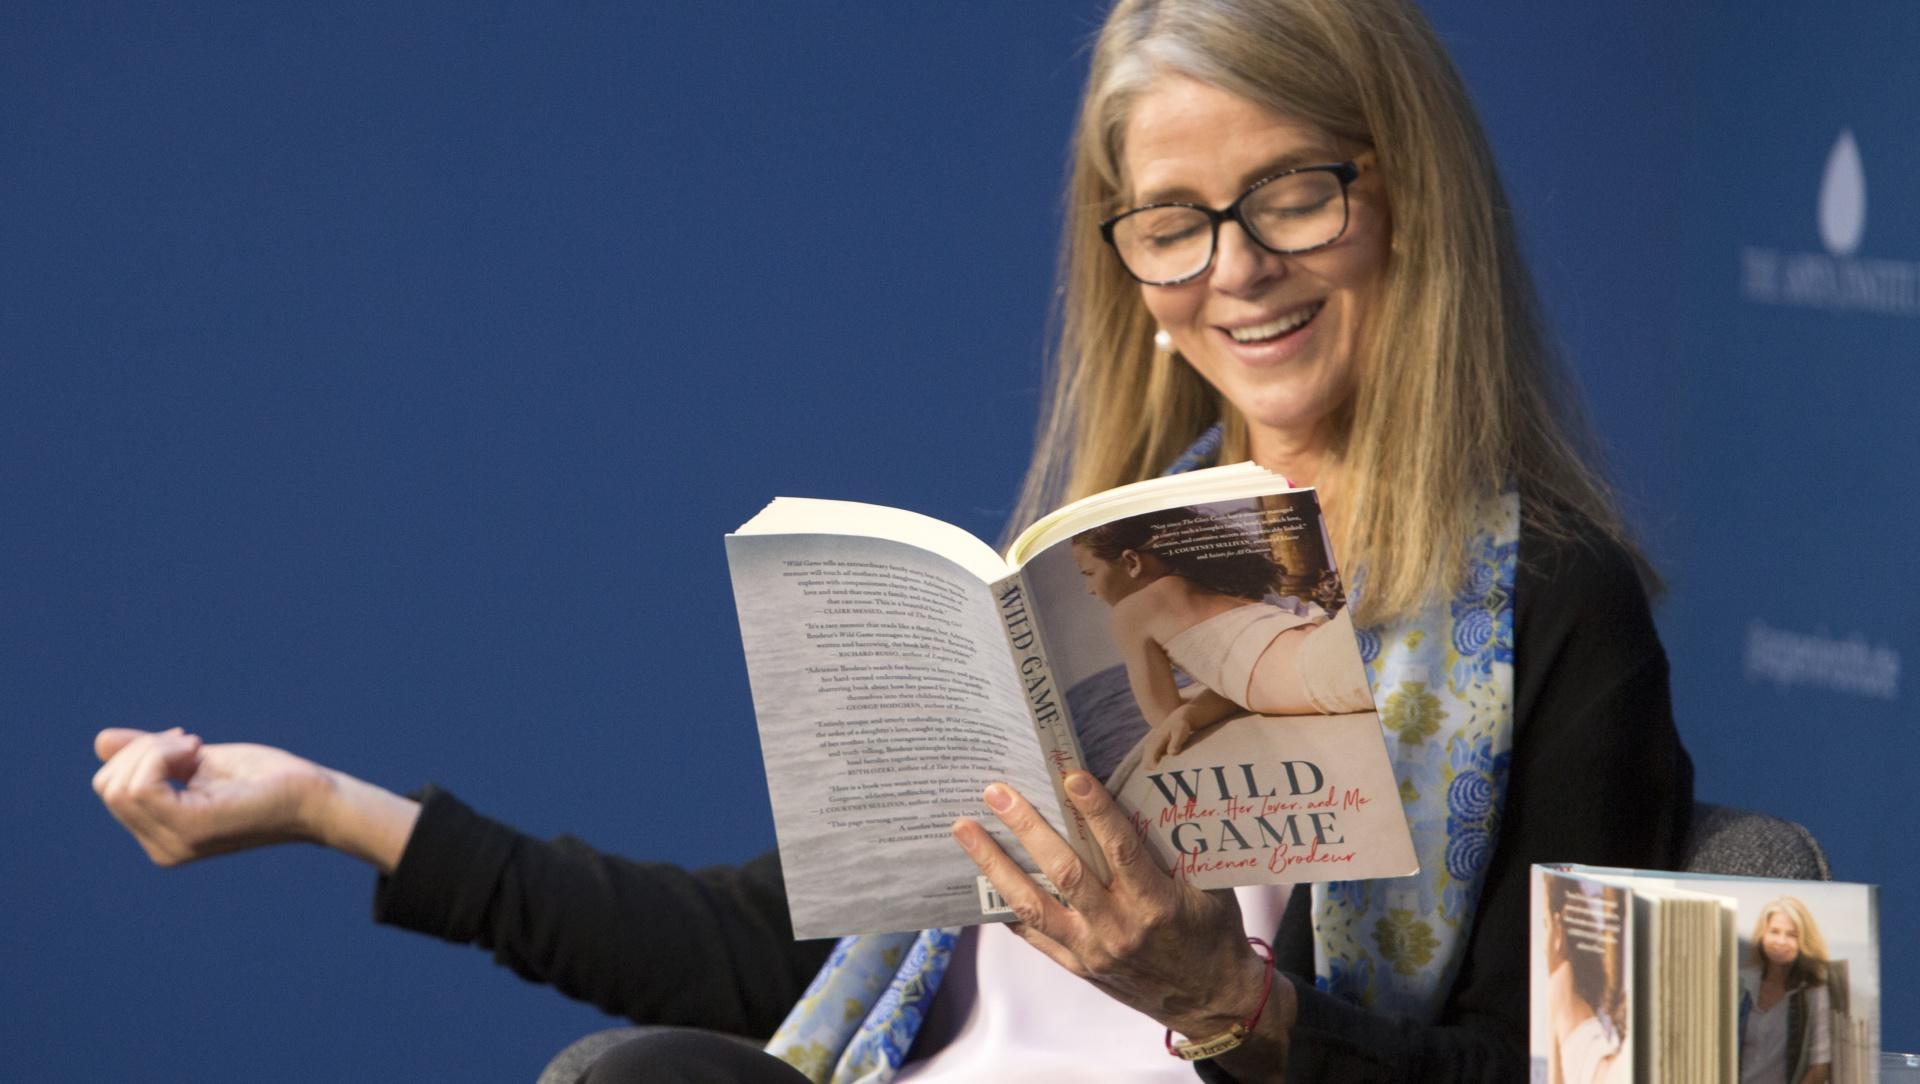 Adrienne Broduer reading an excerpt from her memoir Wild Game.